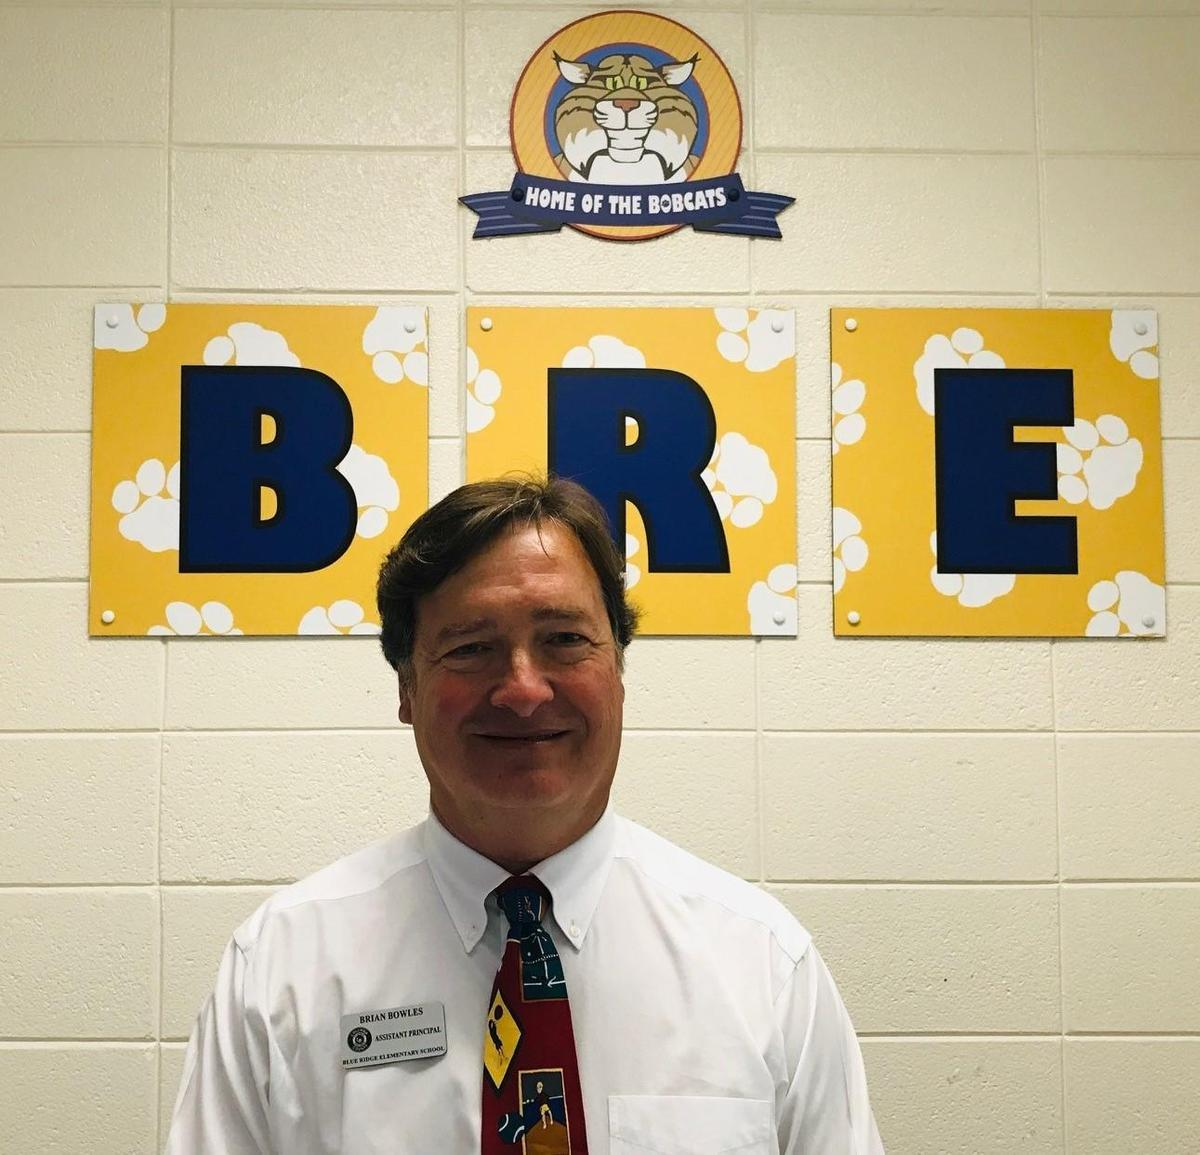 Mr. Brian Bowles, Assistant Principal